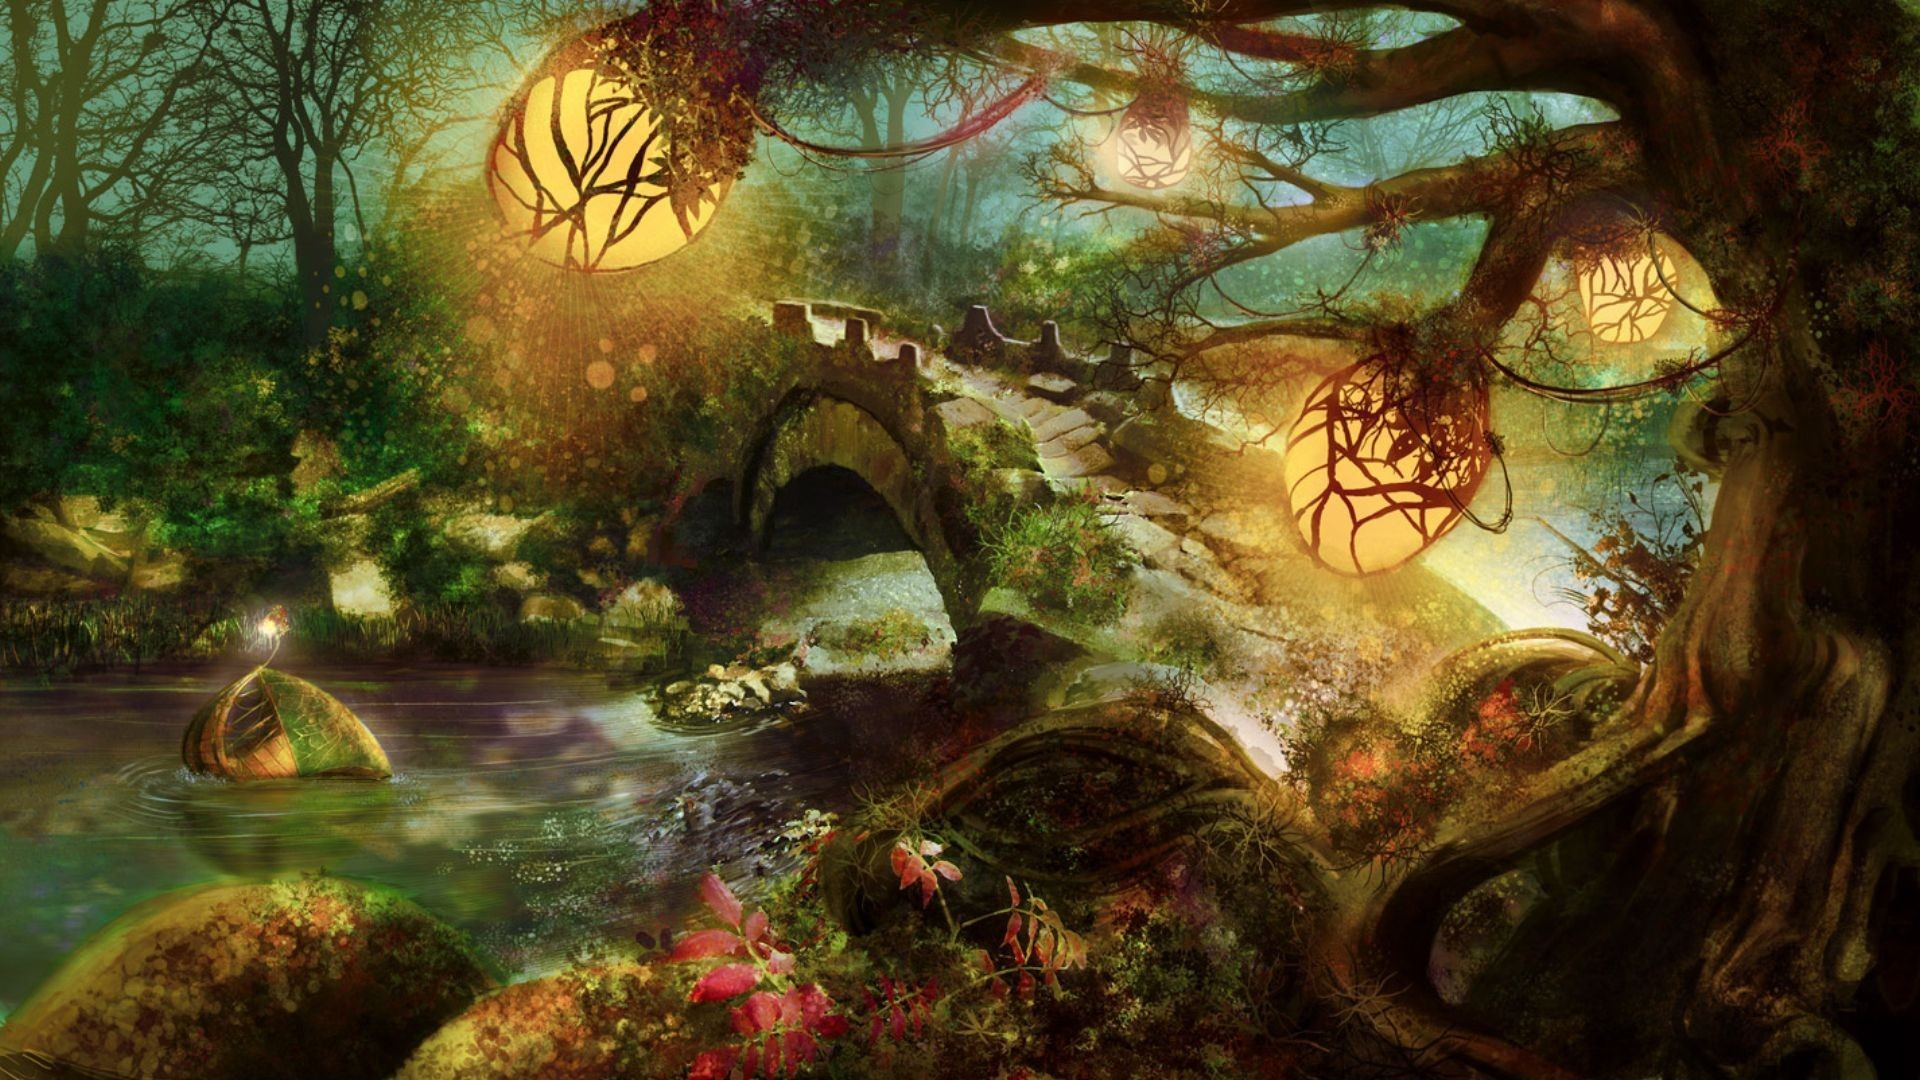 Nature Forest Wallpaper Nature, Forest, Fantasy, Art ..